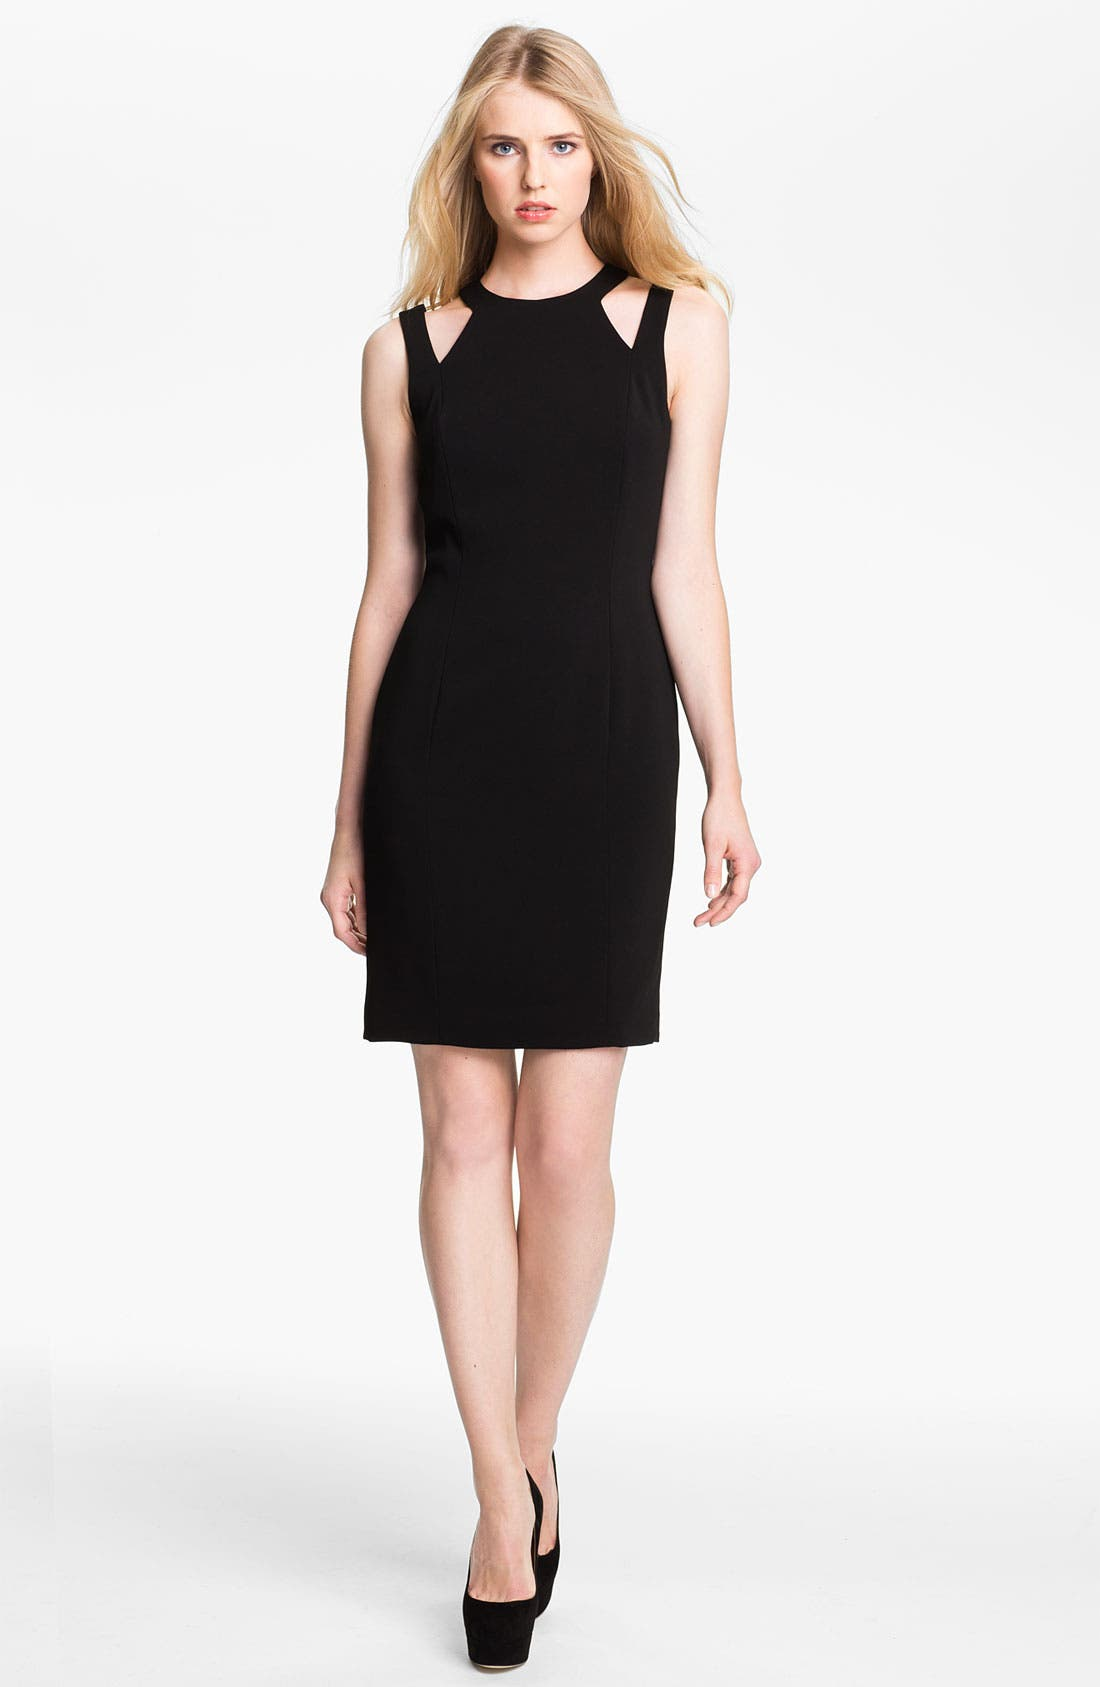 Alternate Image 1 Selected - Jay Godfrey 'Hendry' Jersey Dress